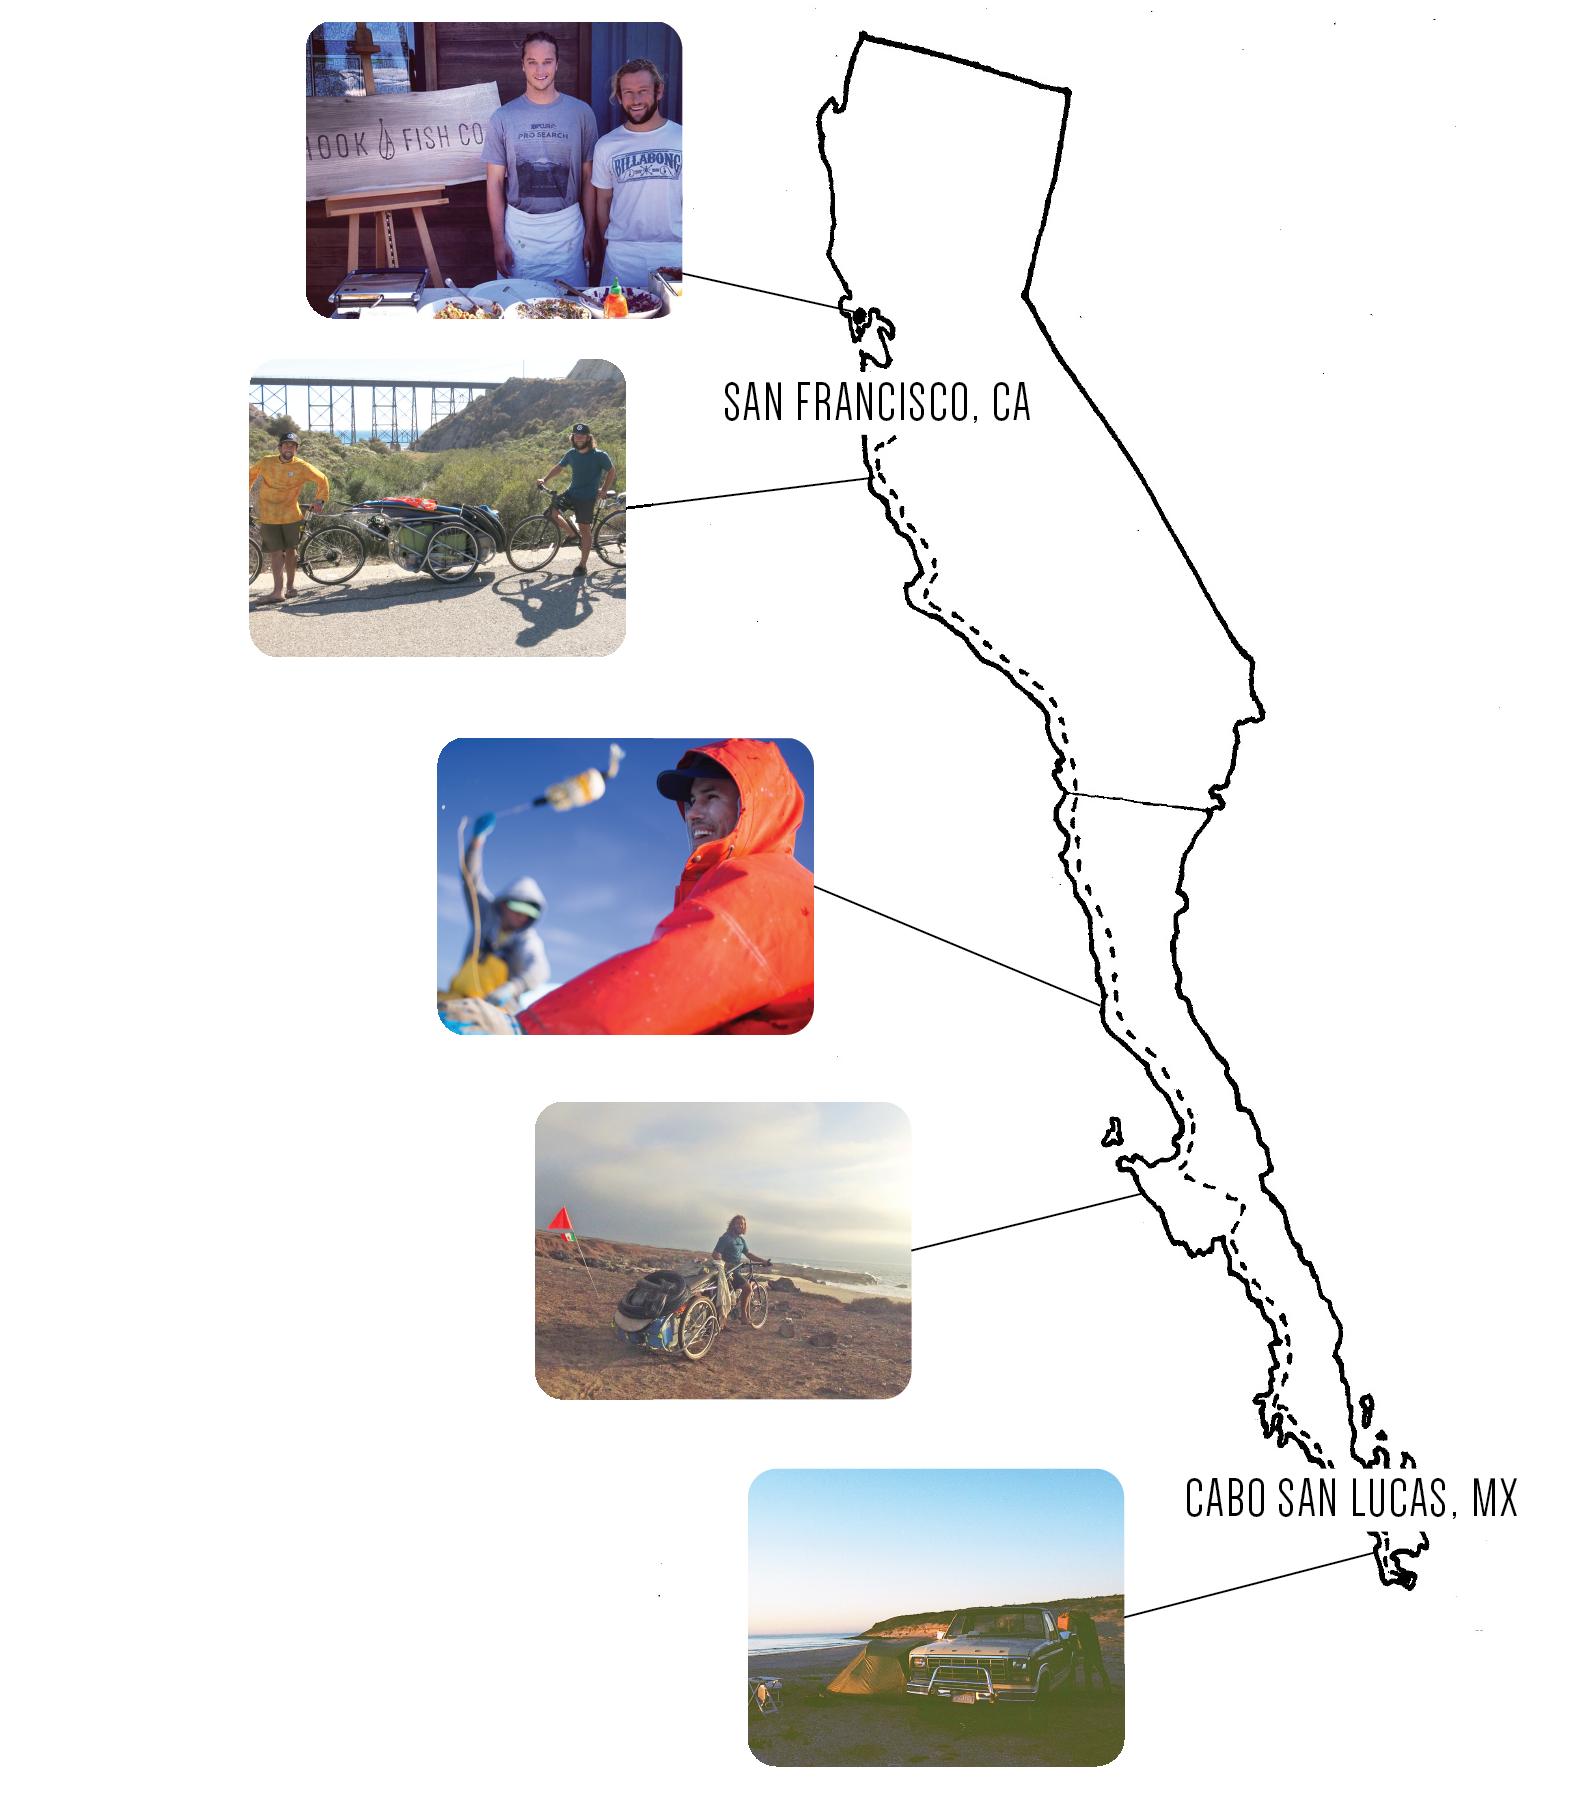 CA-Baja_map_graphic-01